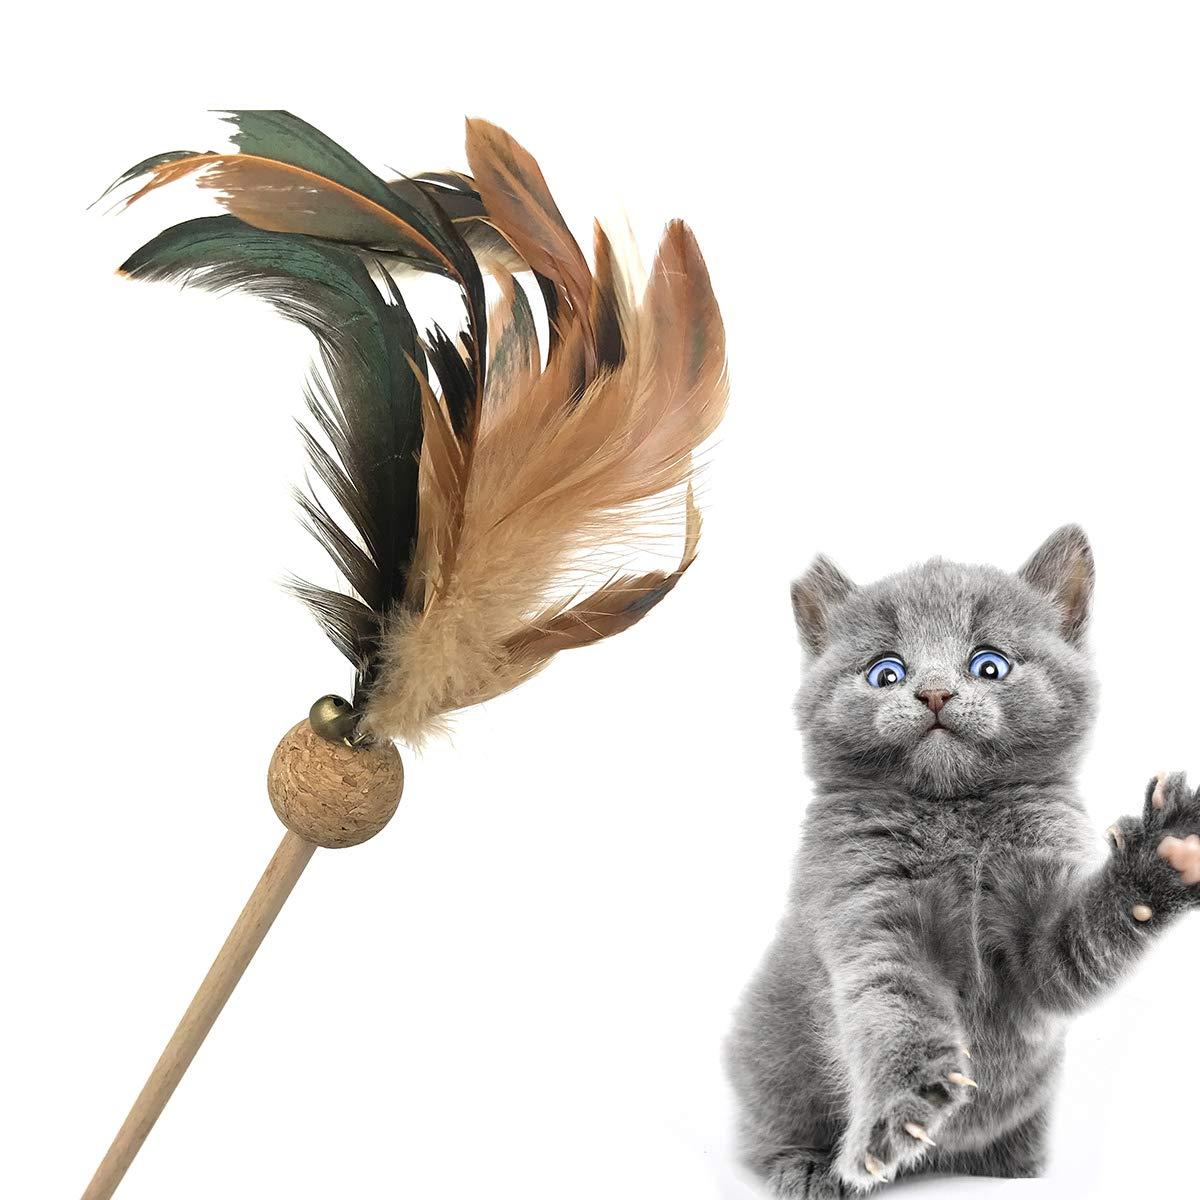 Cataria Best Kitten Toys - Wooden Cat Teaser Feather Teaser Wand 2pc